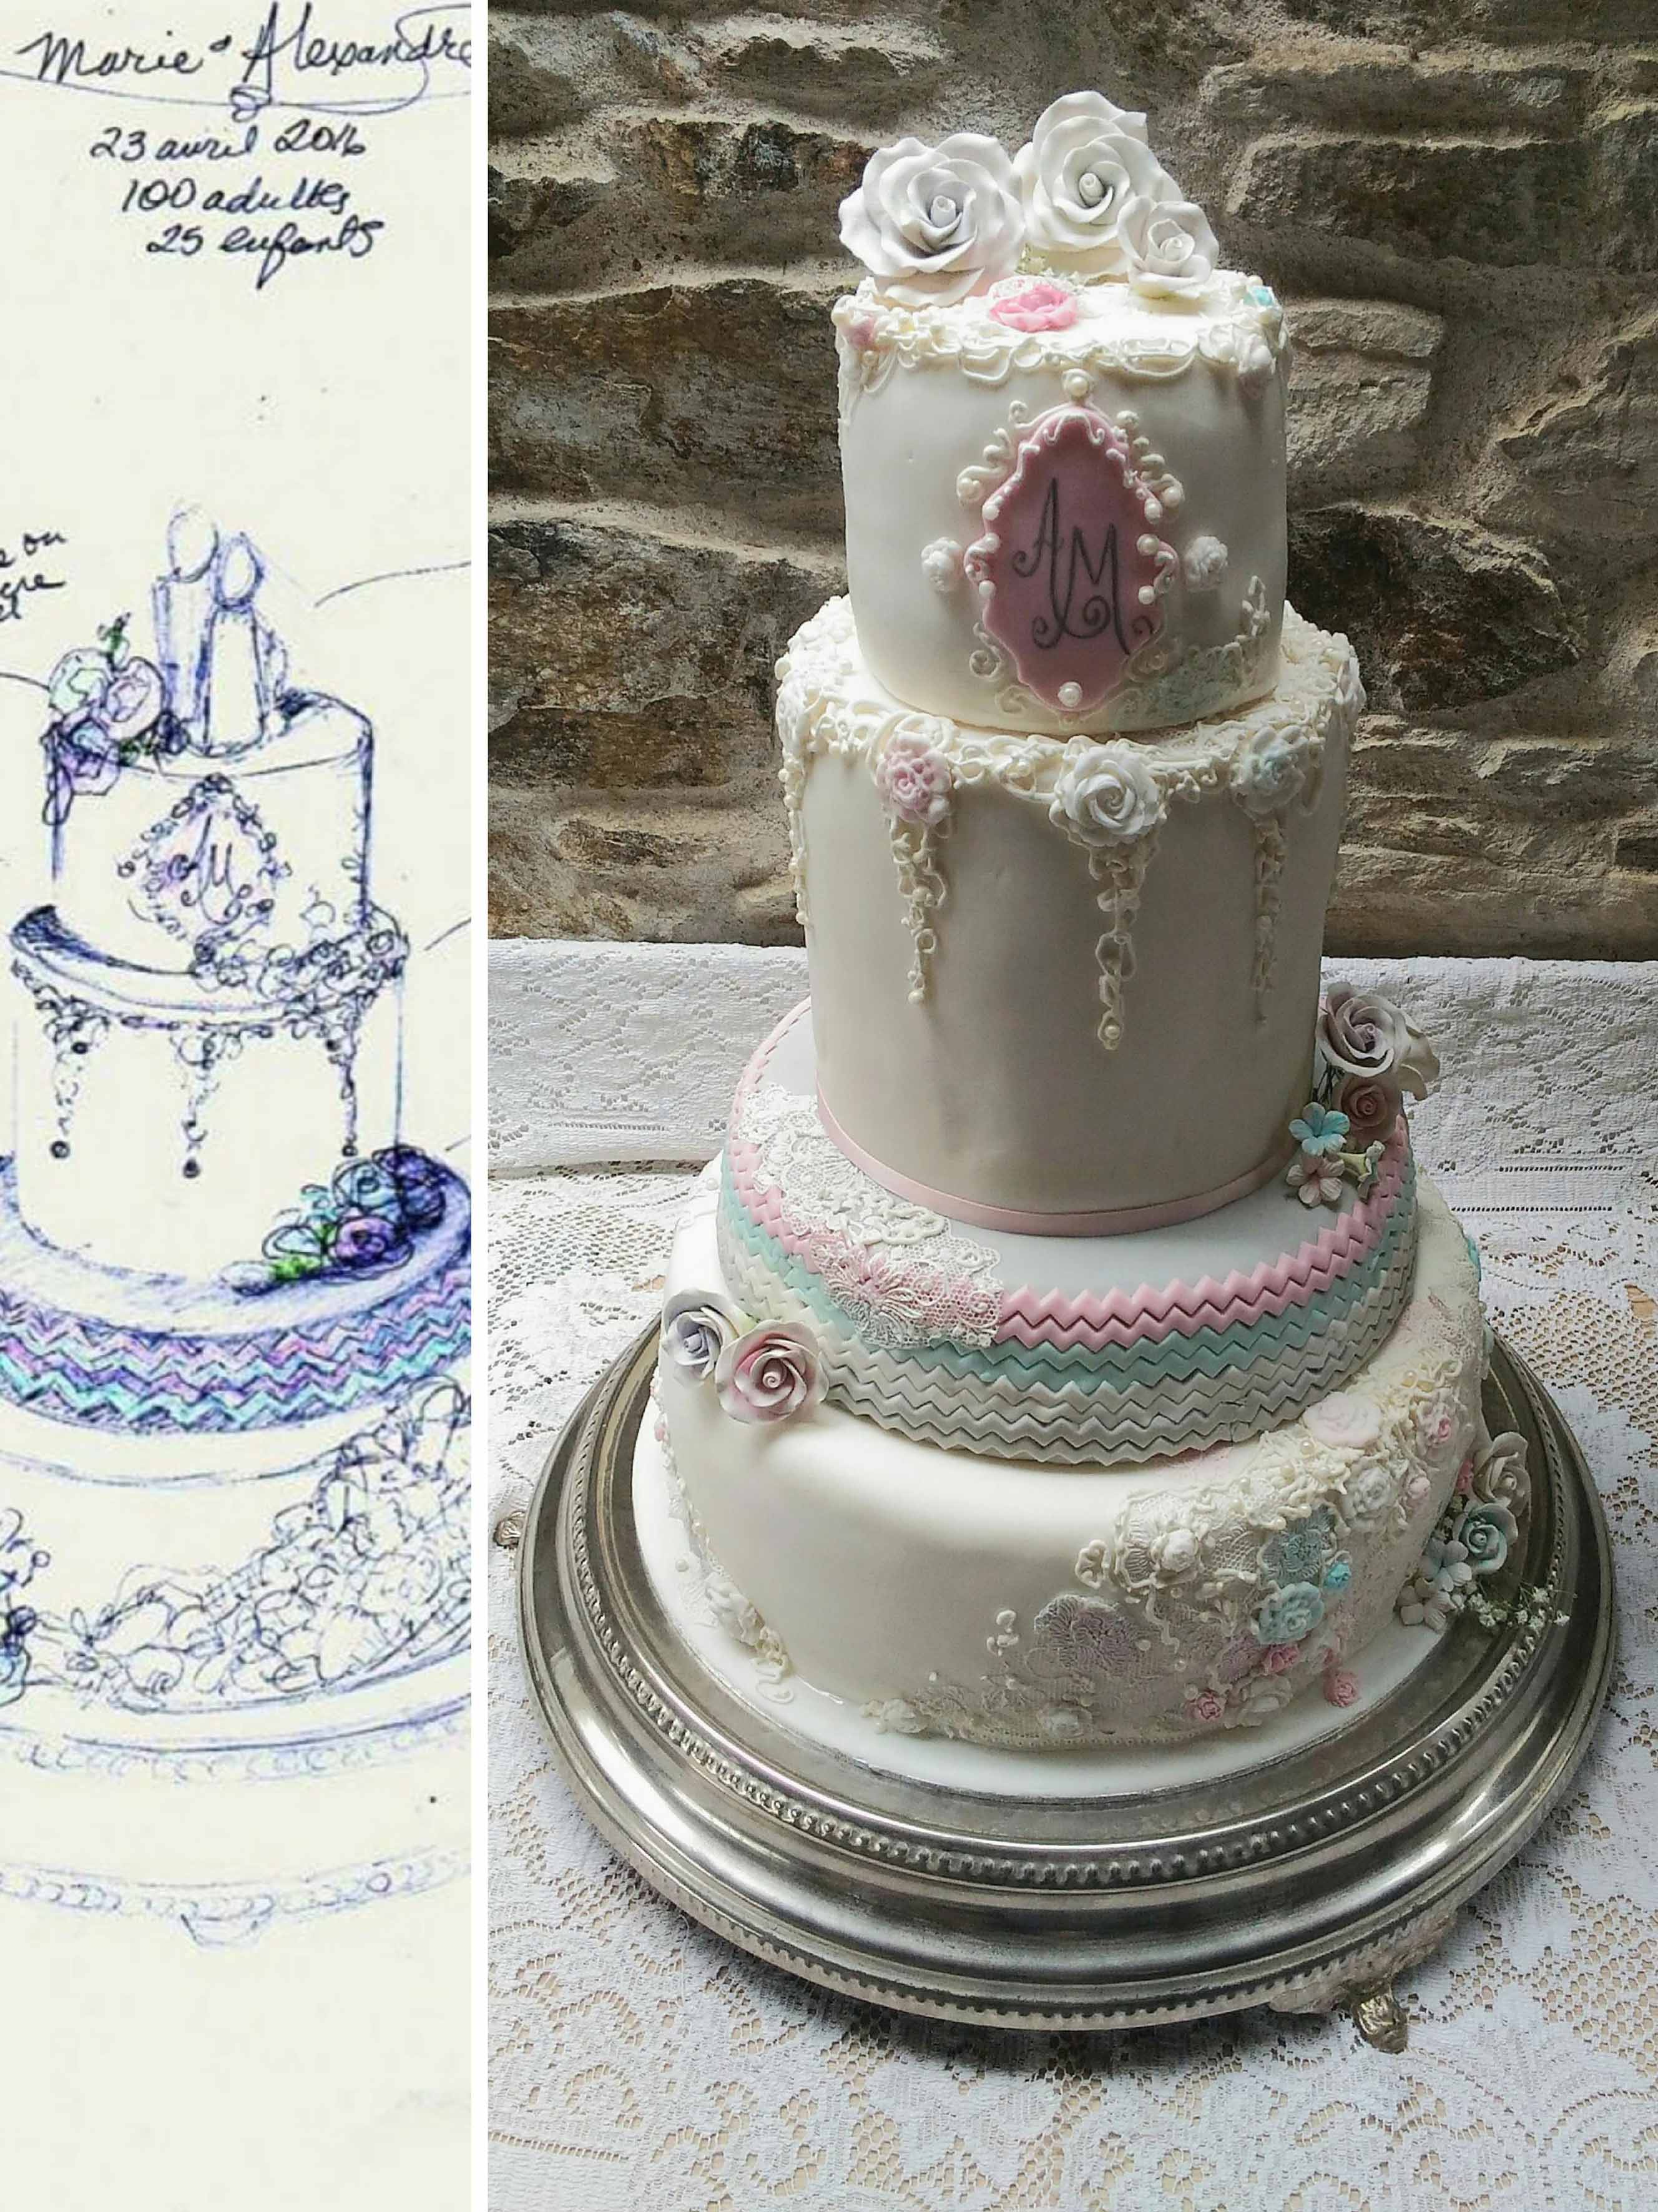 Gateau de mariage Nantes wedding cake